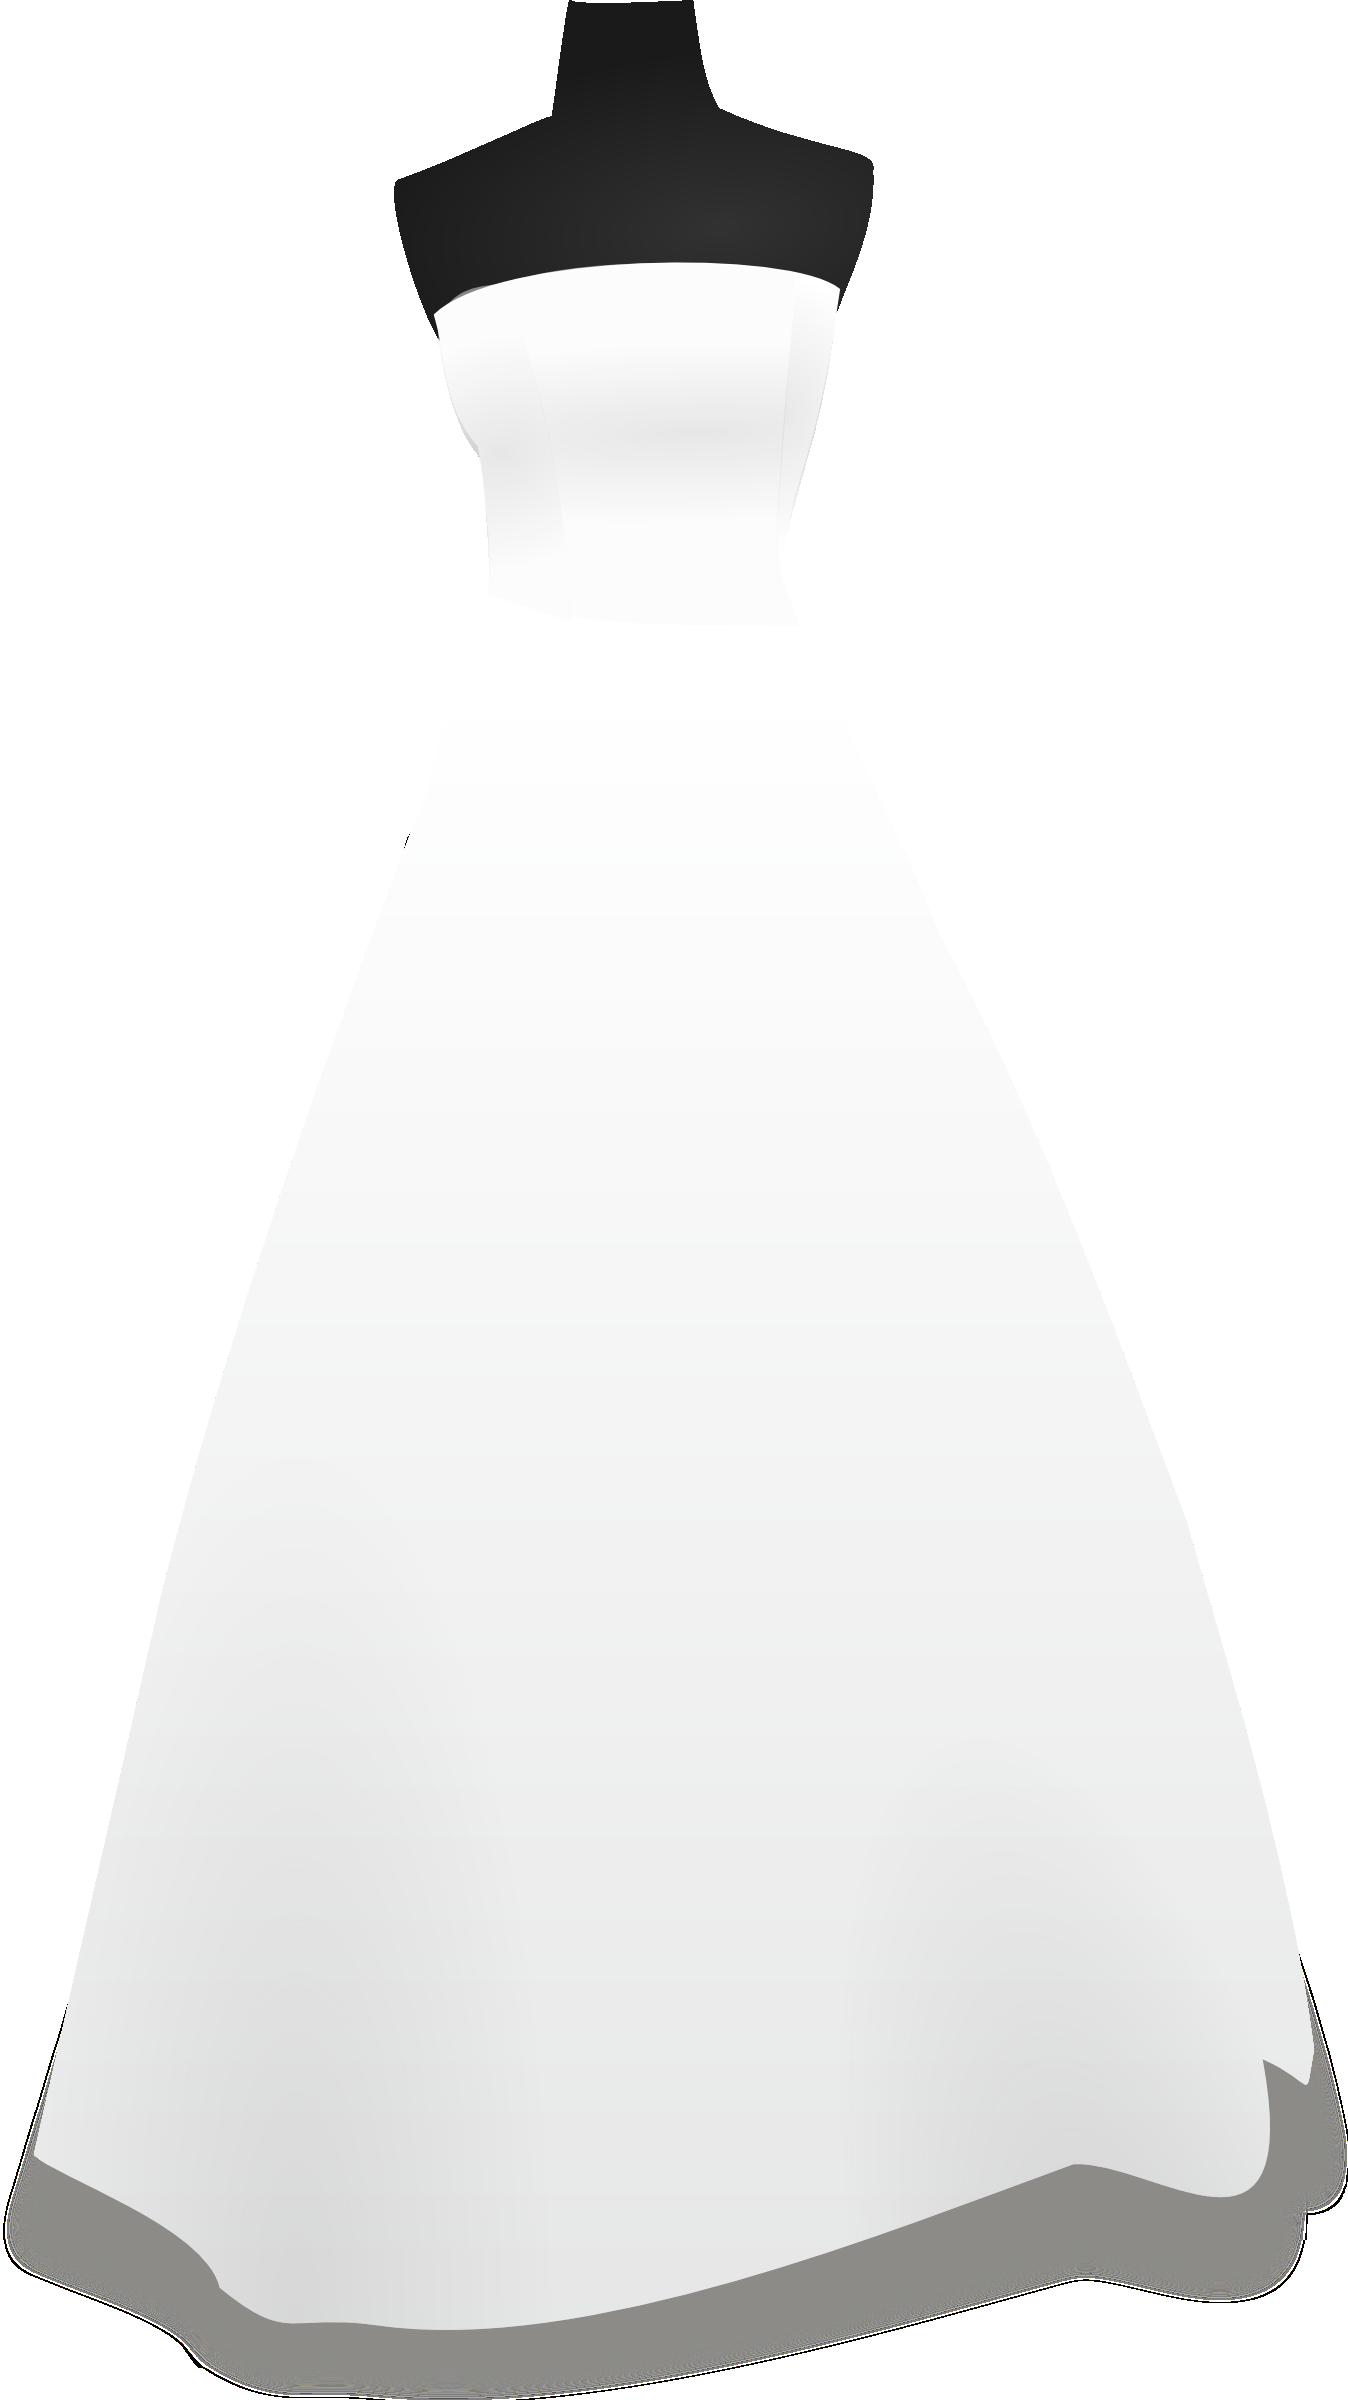 Costume clipart clothing. Wedding dress png panda